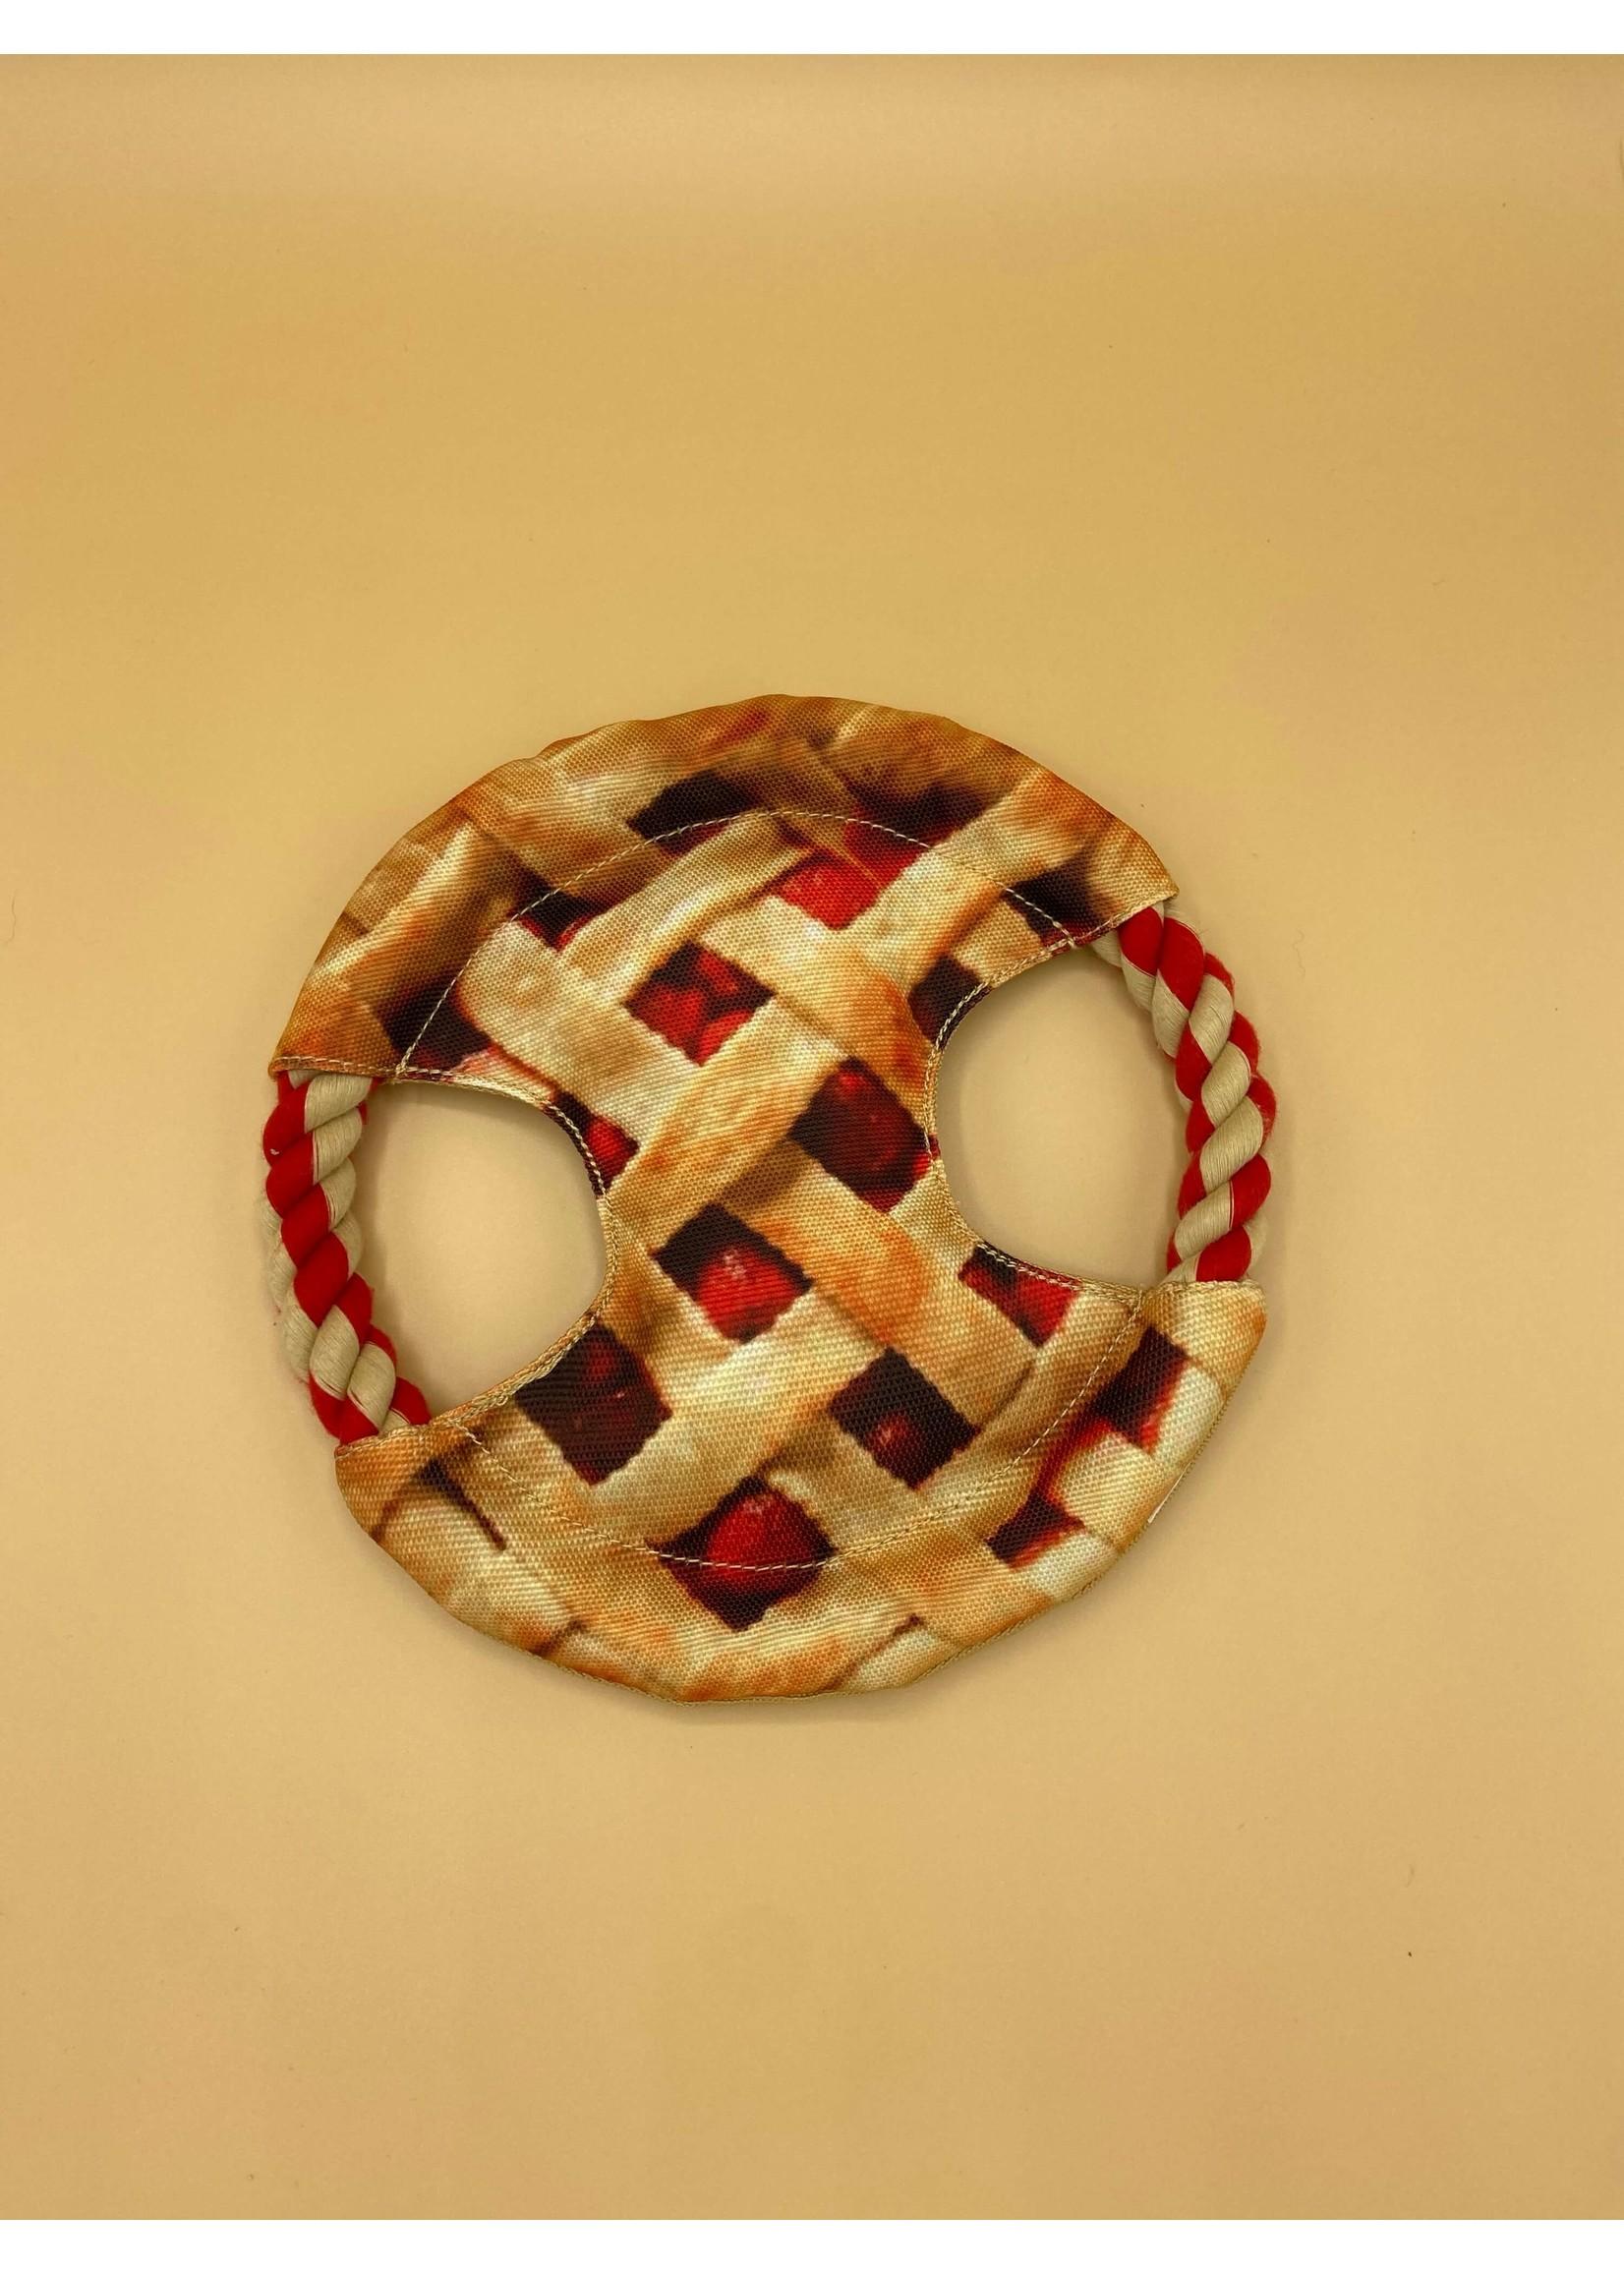 Pie Rope Toy